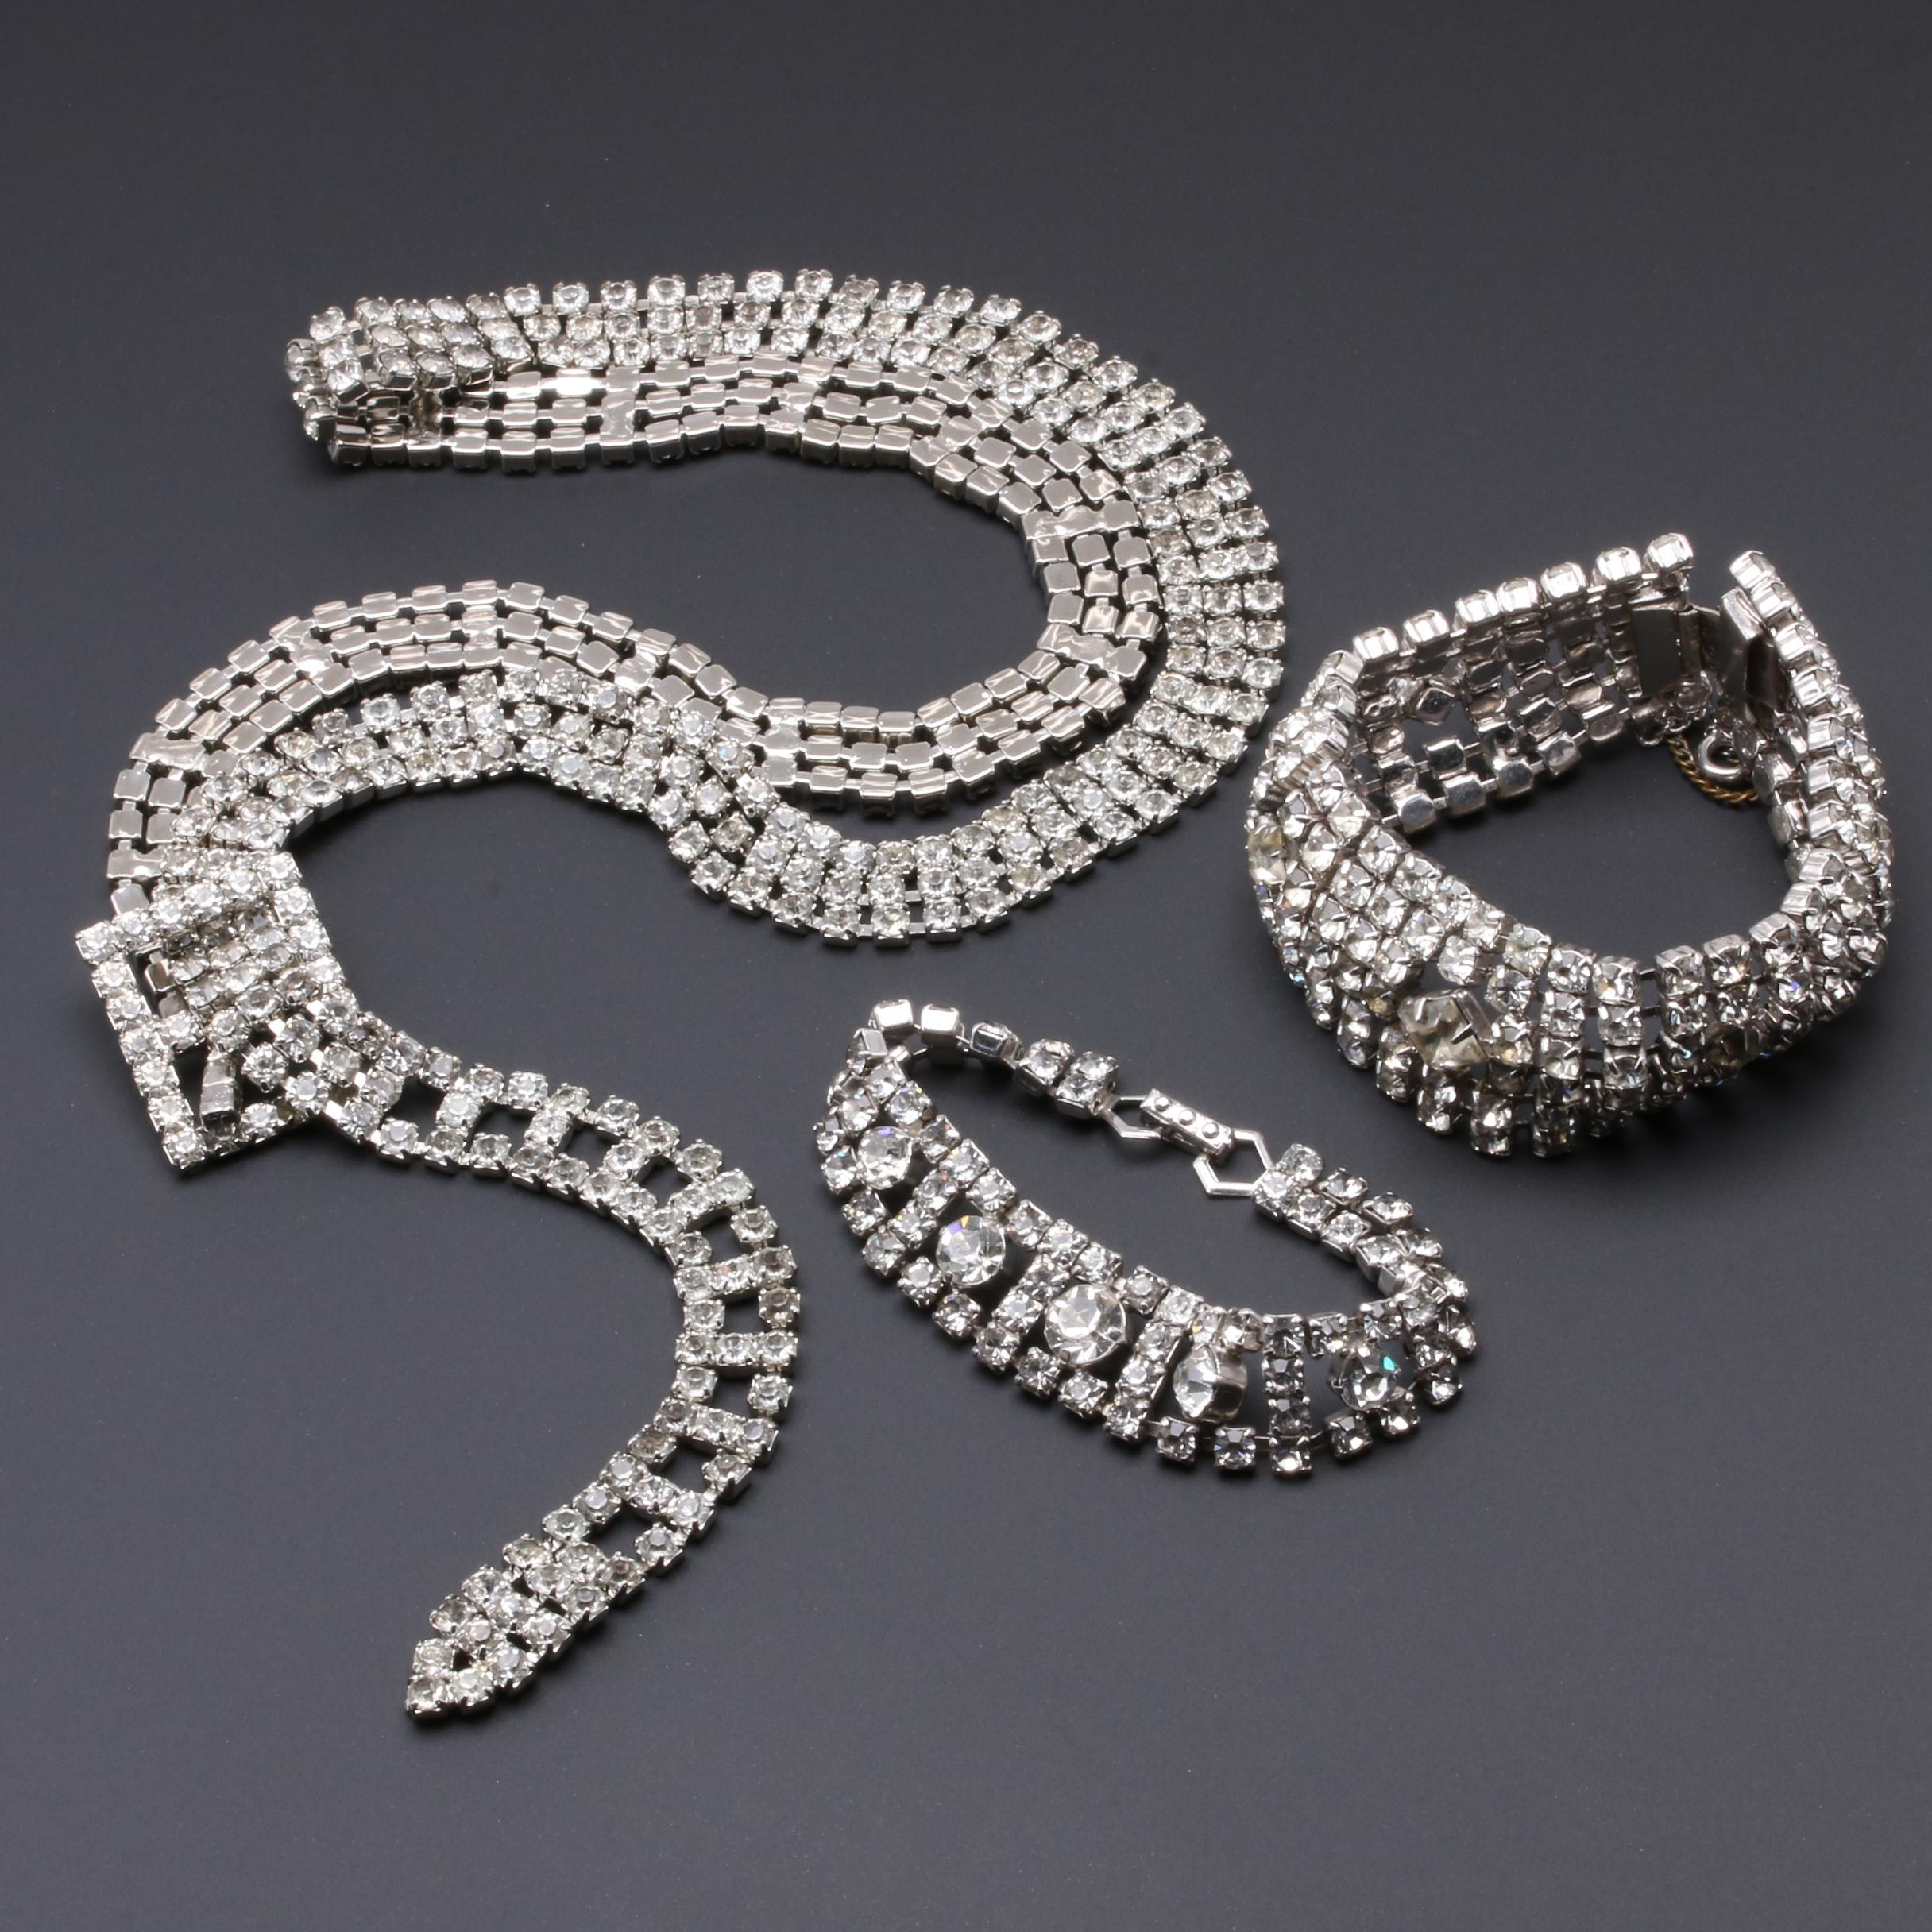 Silver-Tone Foilback Bracelet and Belt Selection Featuring La Rel